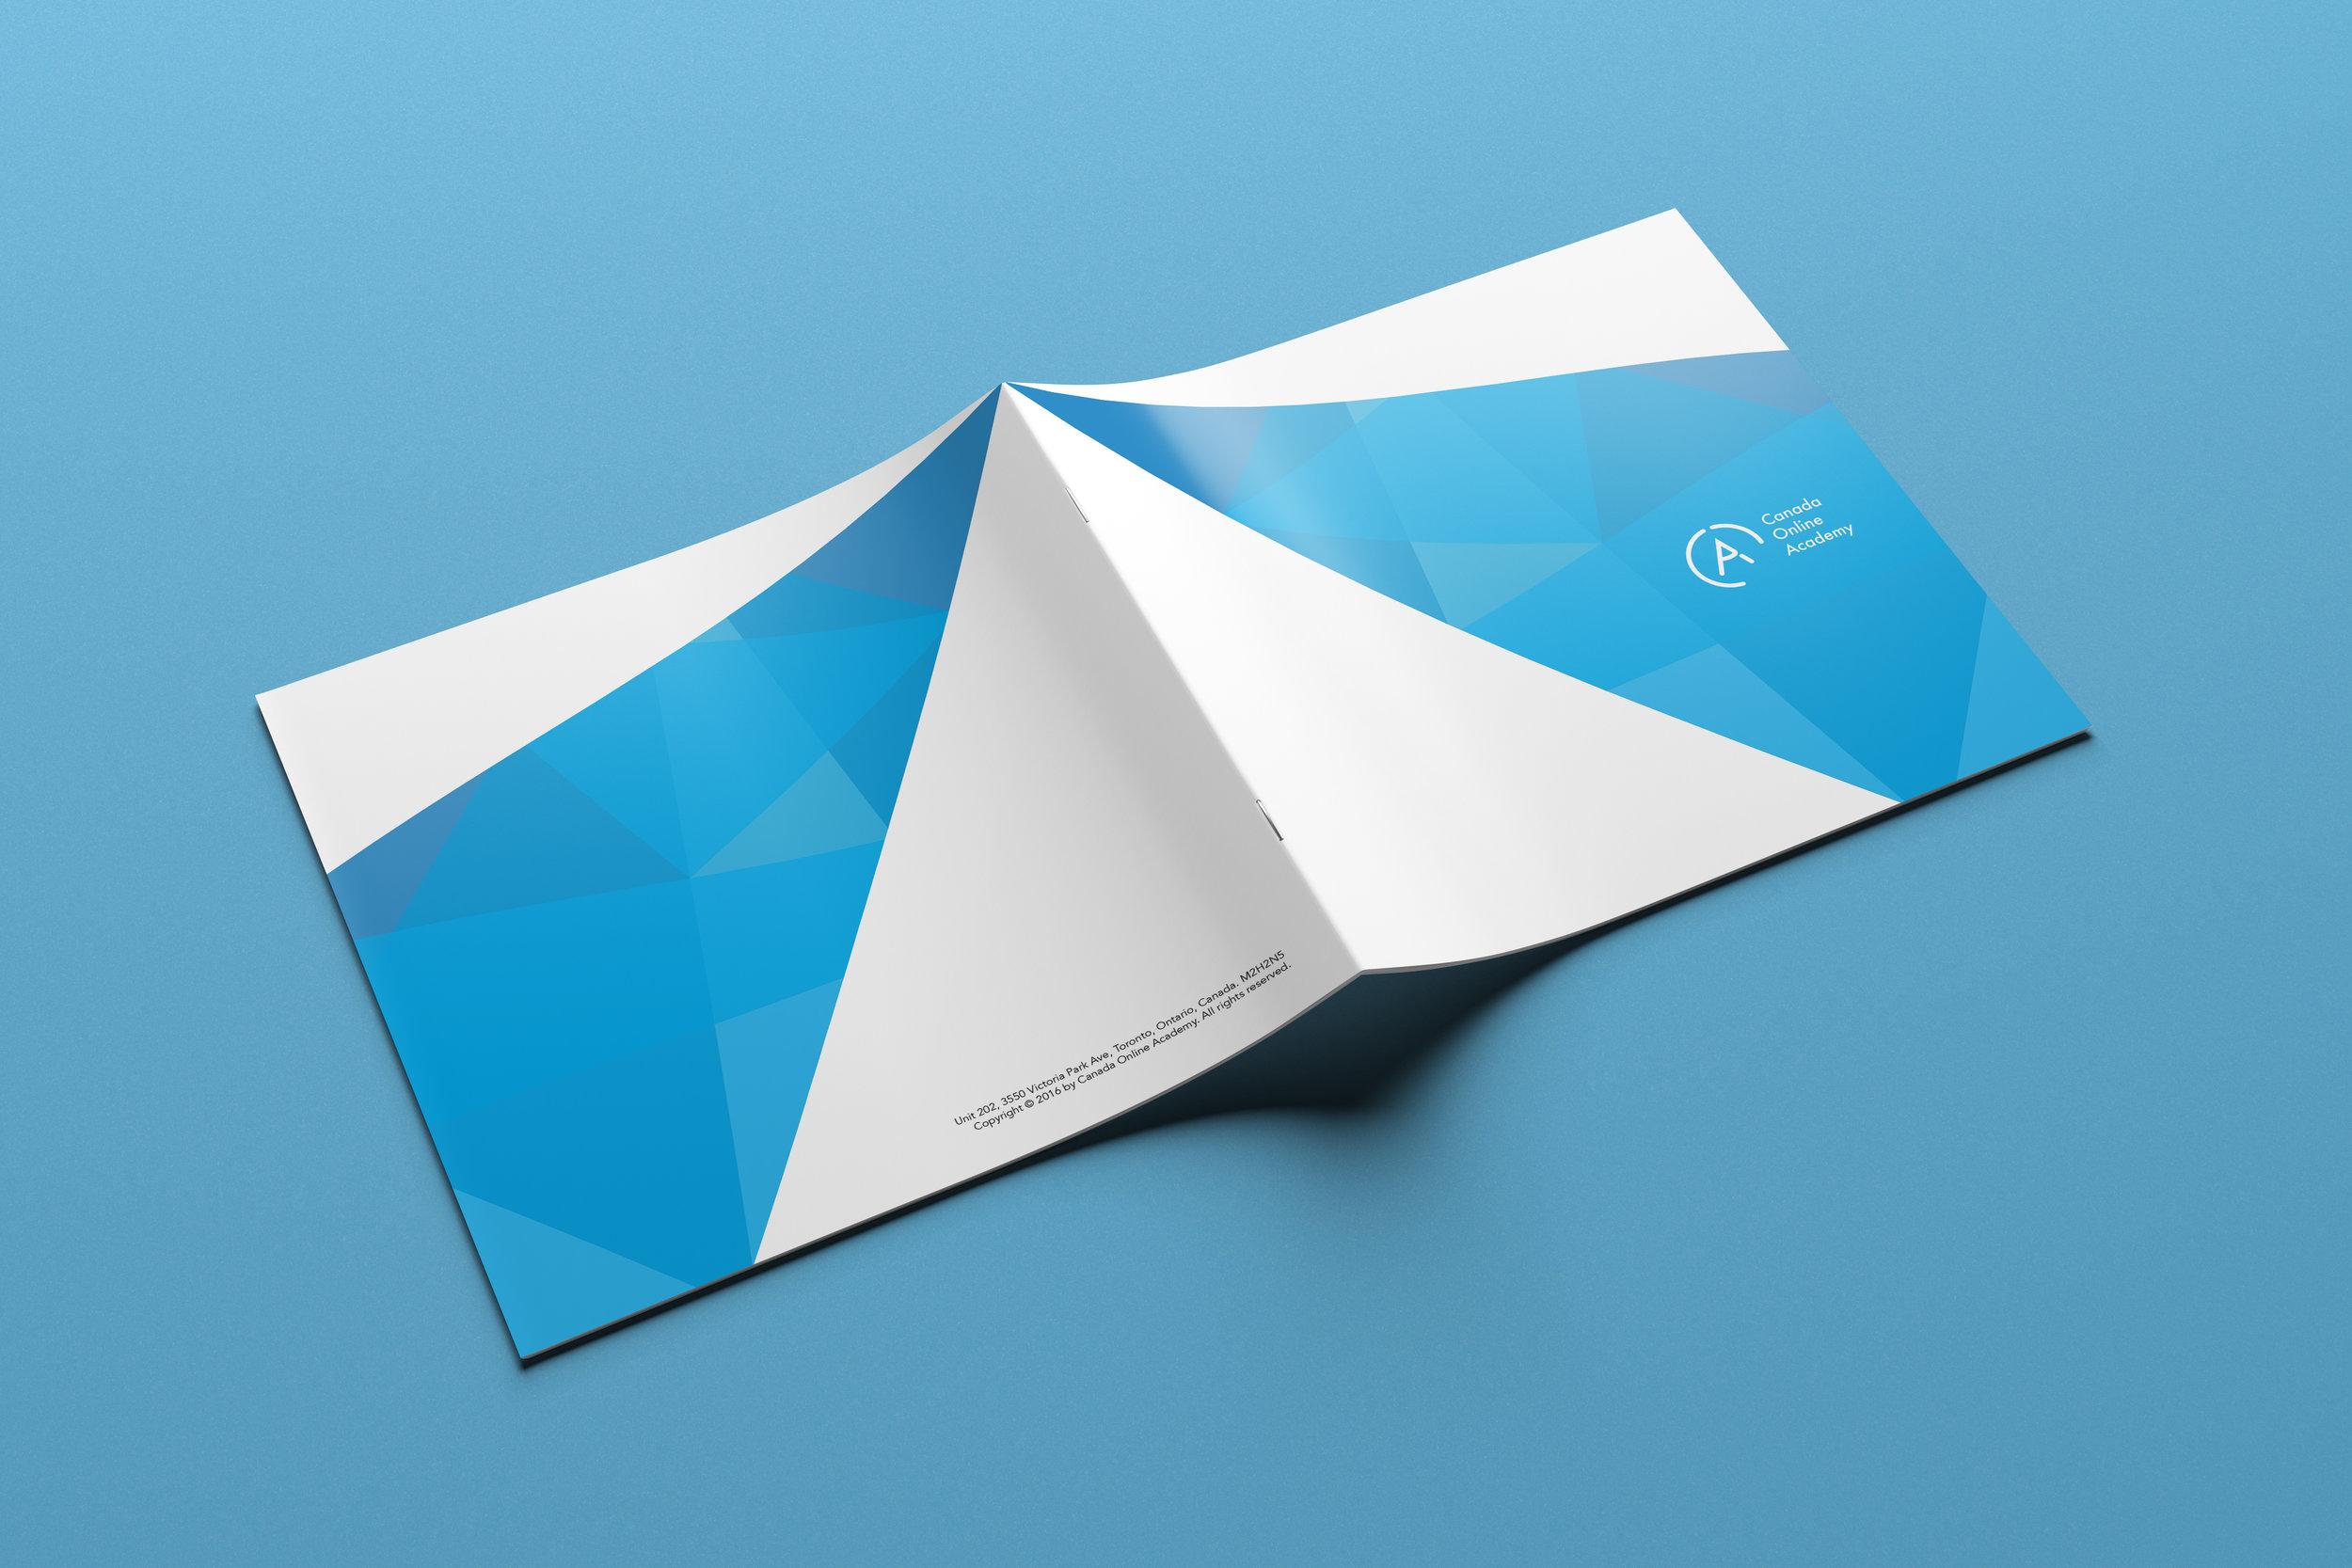 Angle 45 - Cover Opened.jpg